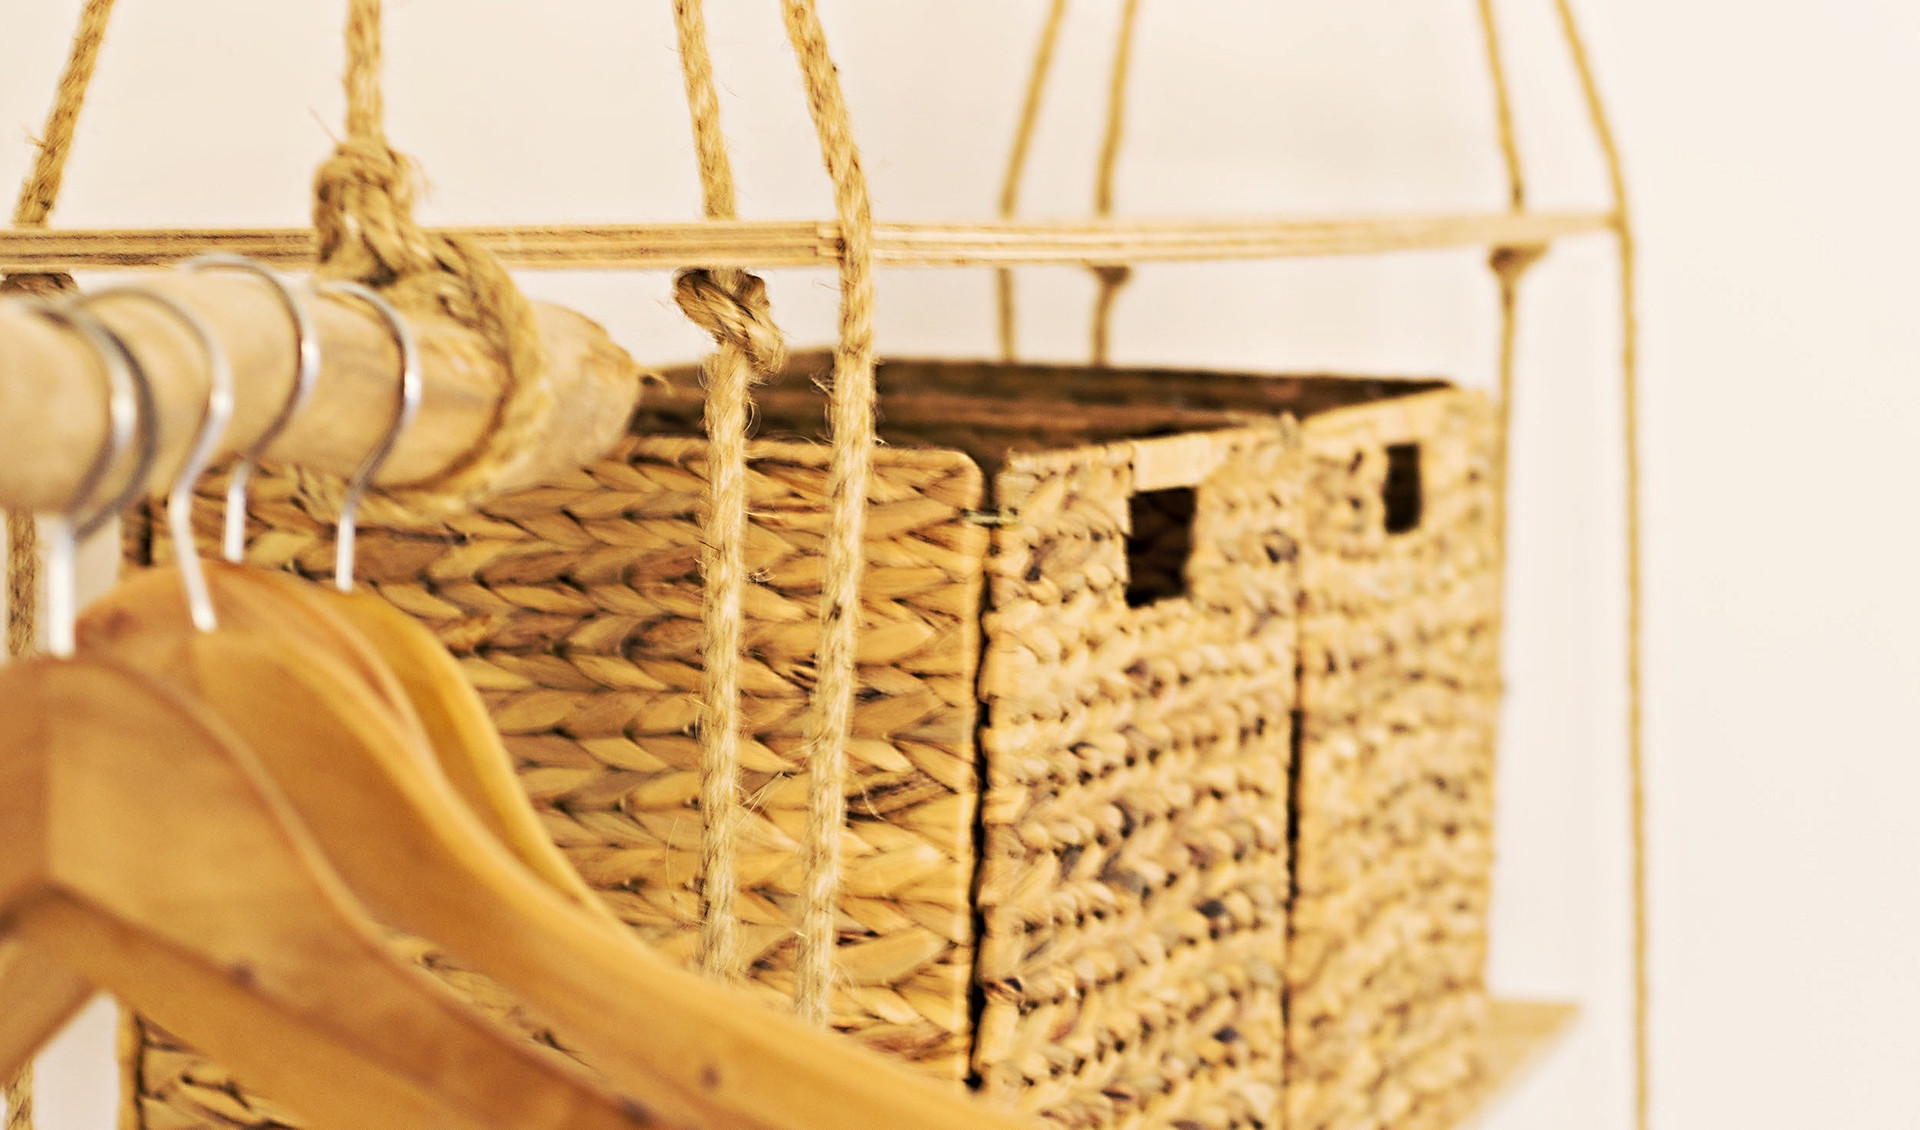 baskethangersRT.jpg